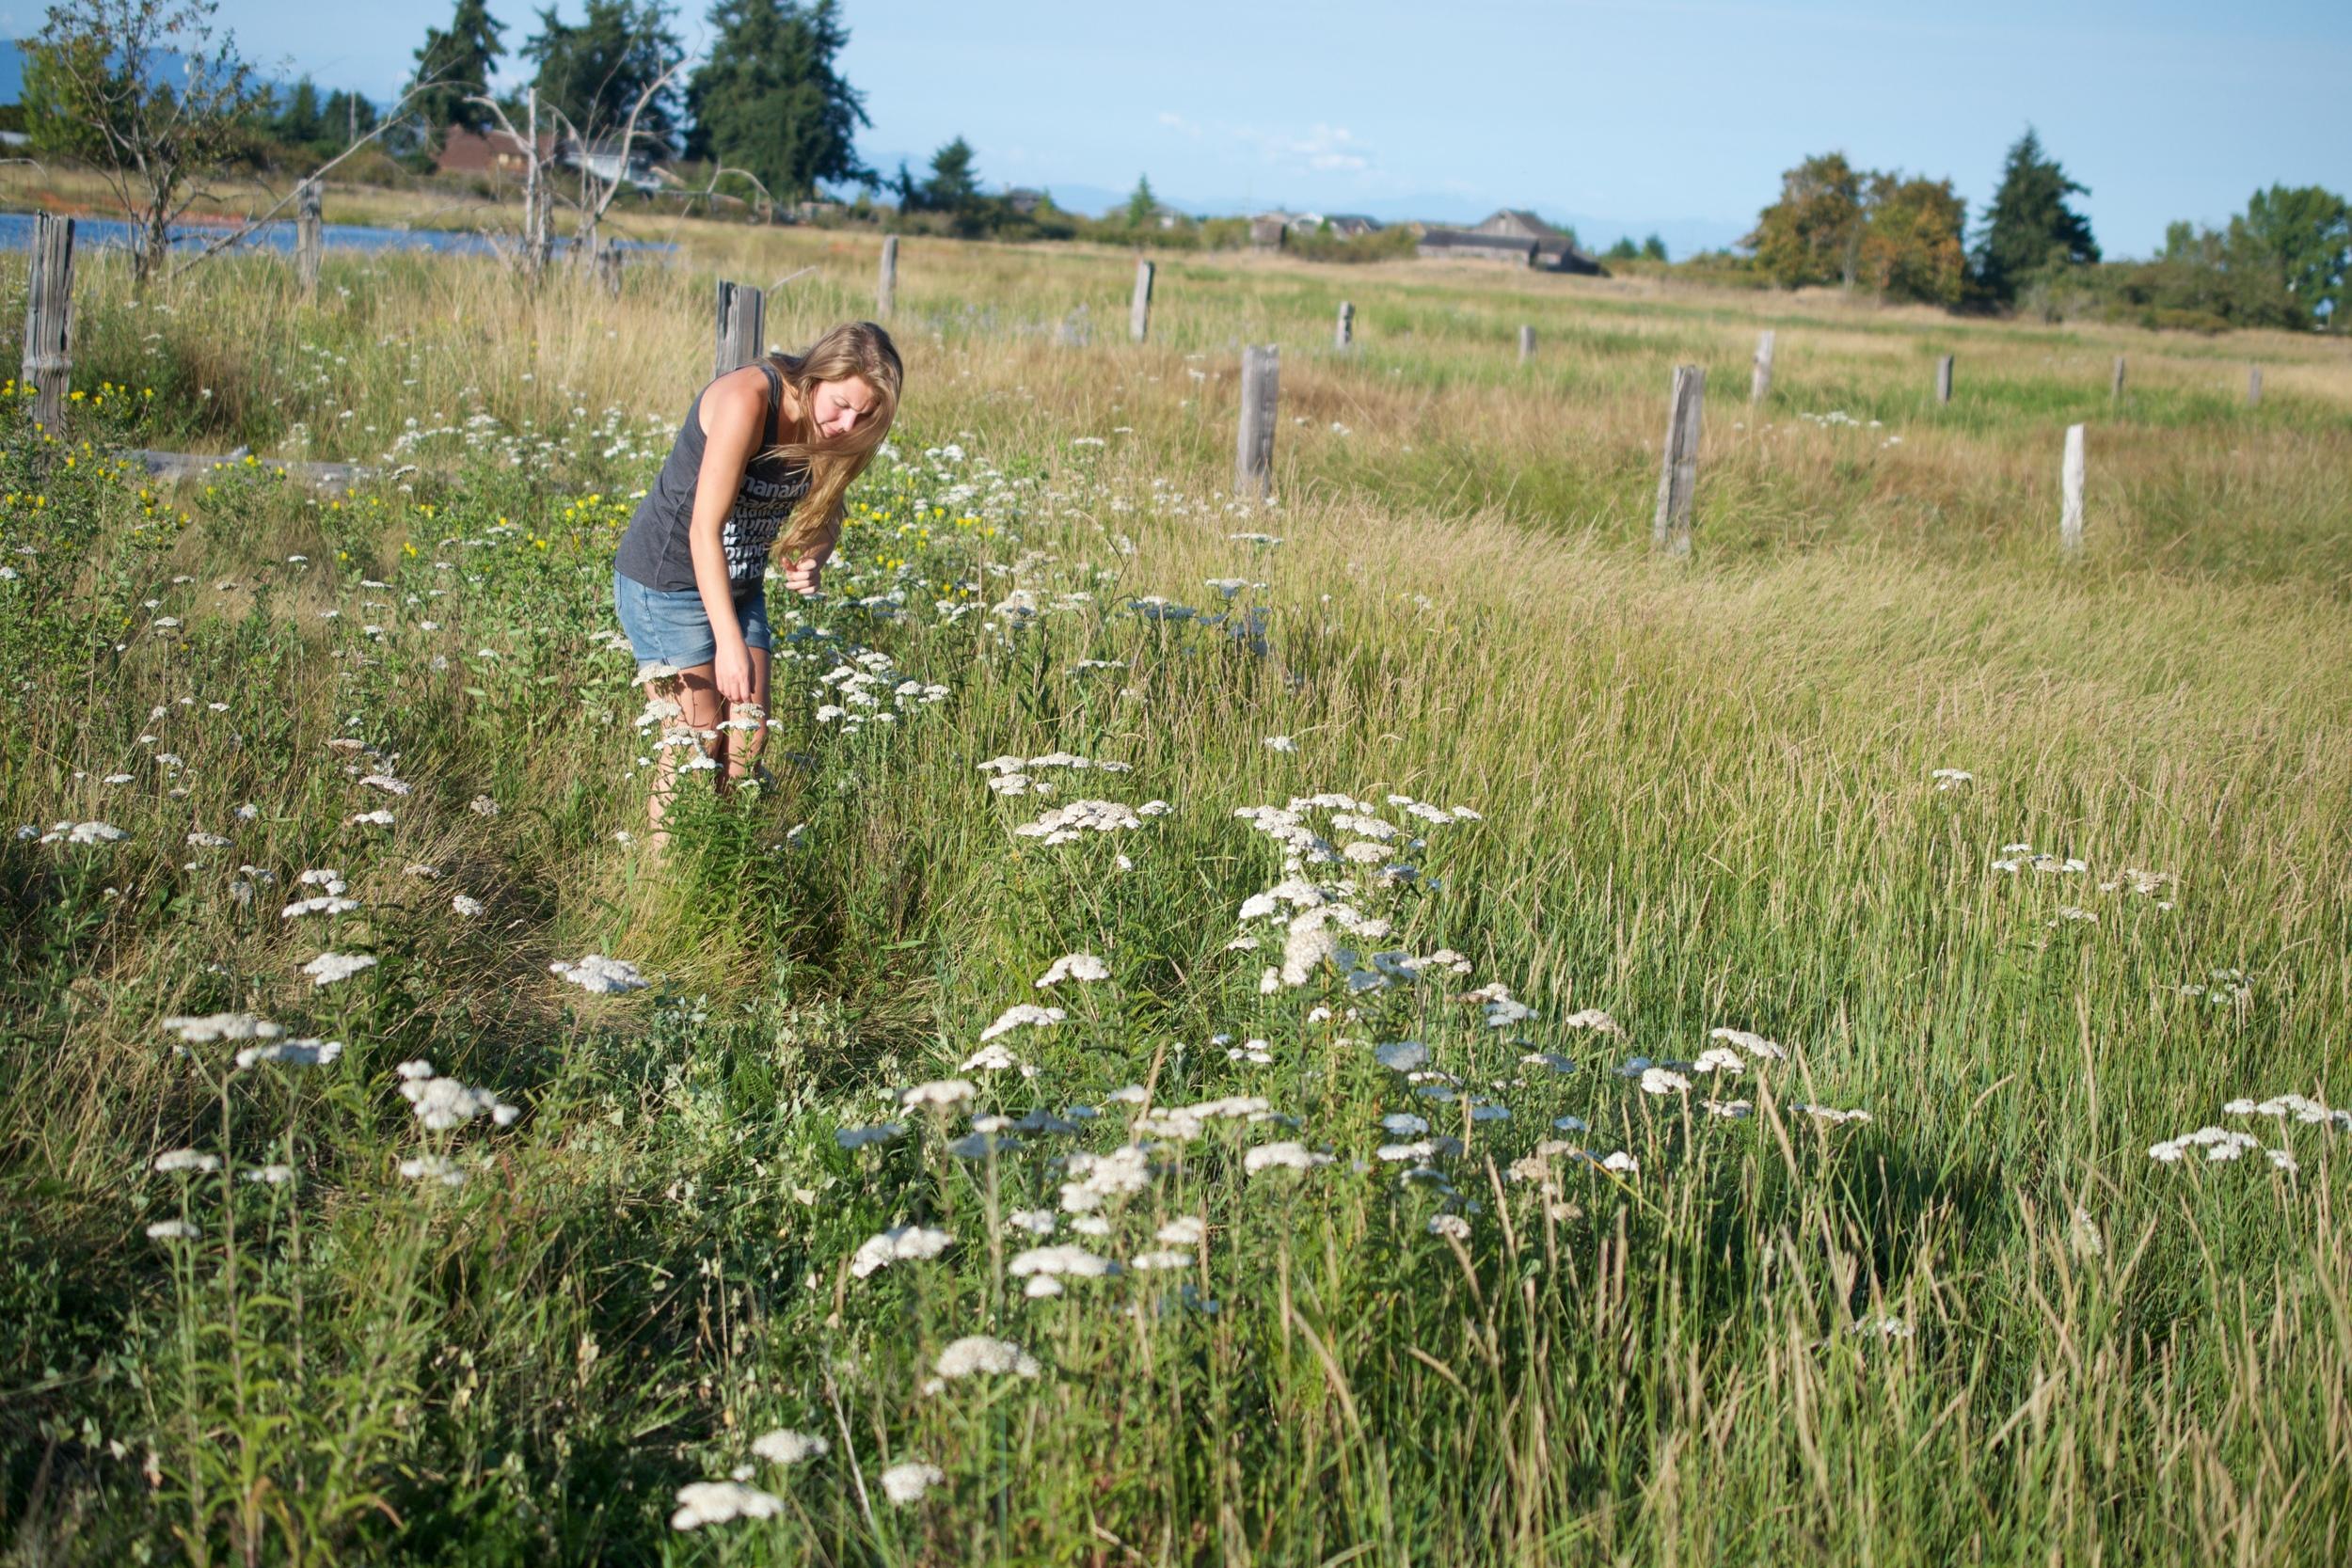 Gathering yarrow, Achillea millefolium in the later summer.